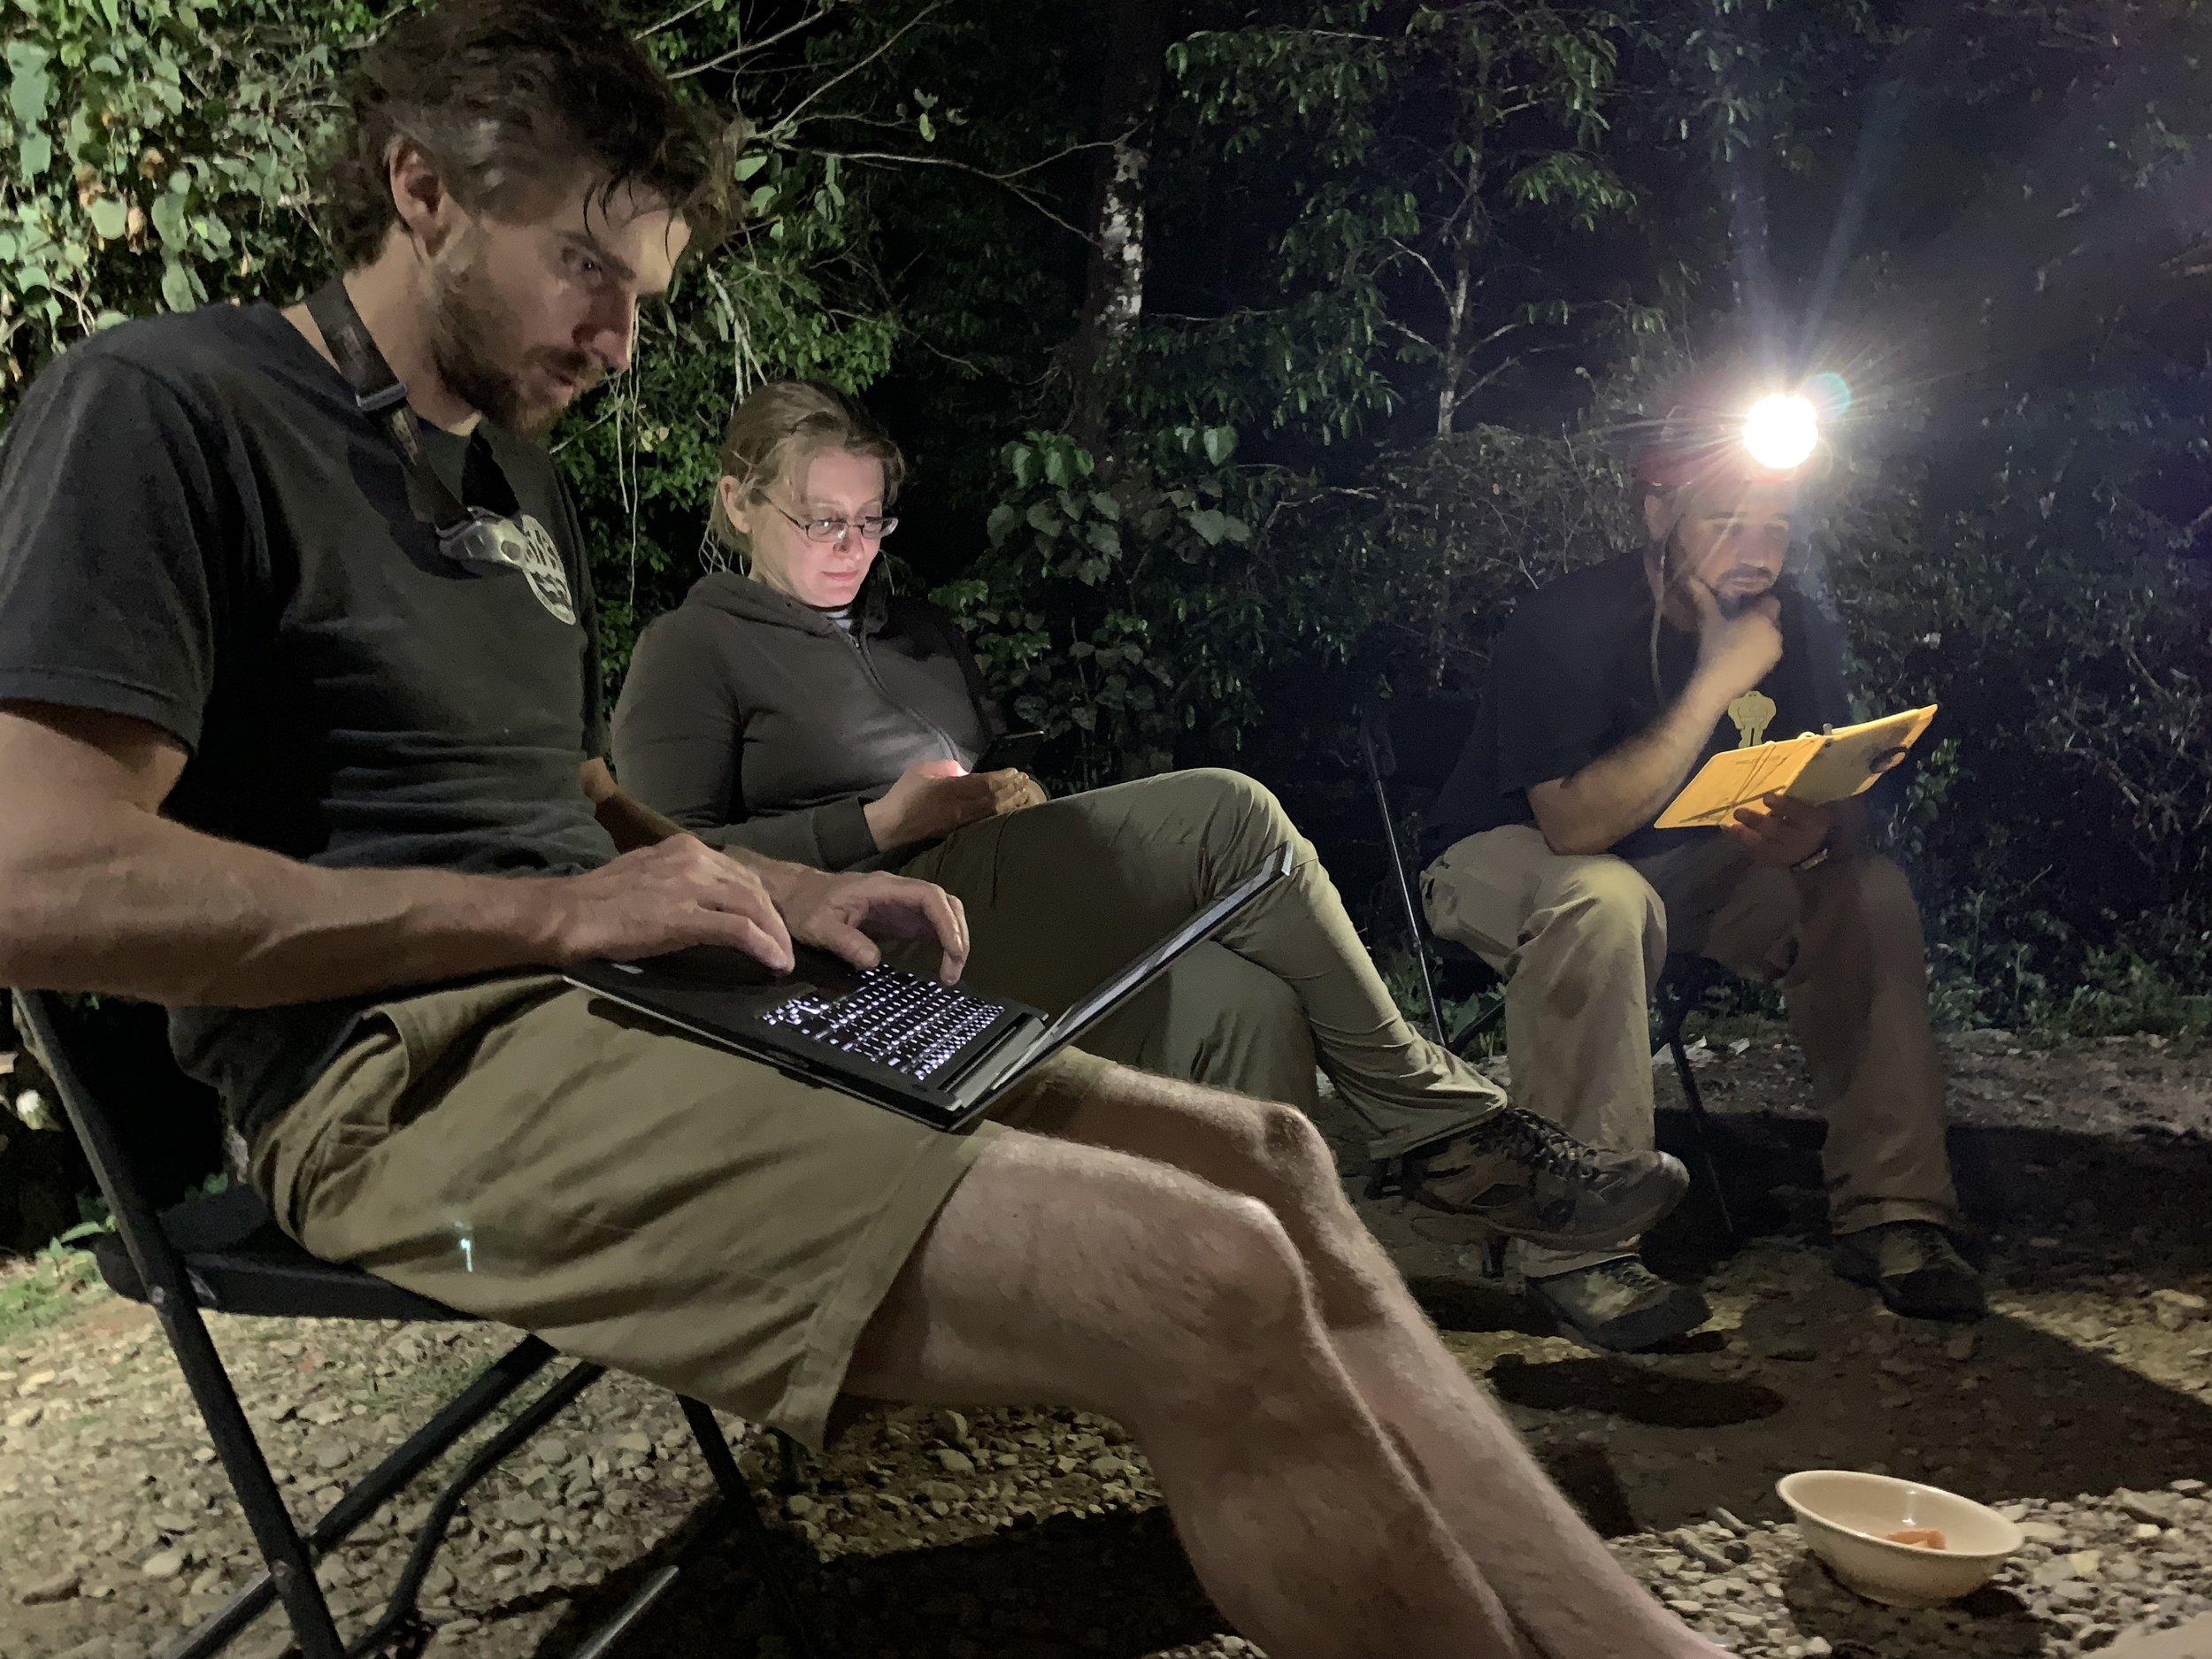 Jon Lillestolen, Gilly Elor, and Zeb Lilly entering survey data. Photo by Teddy Garlock.